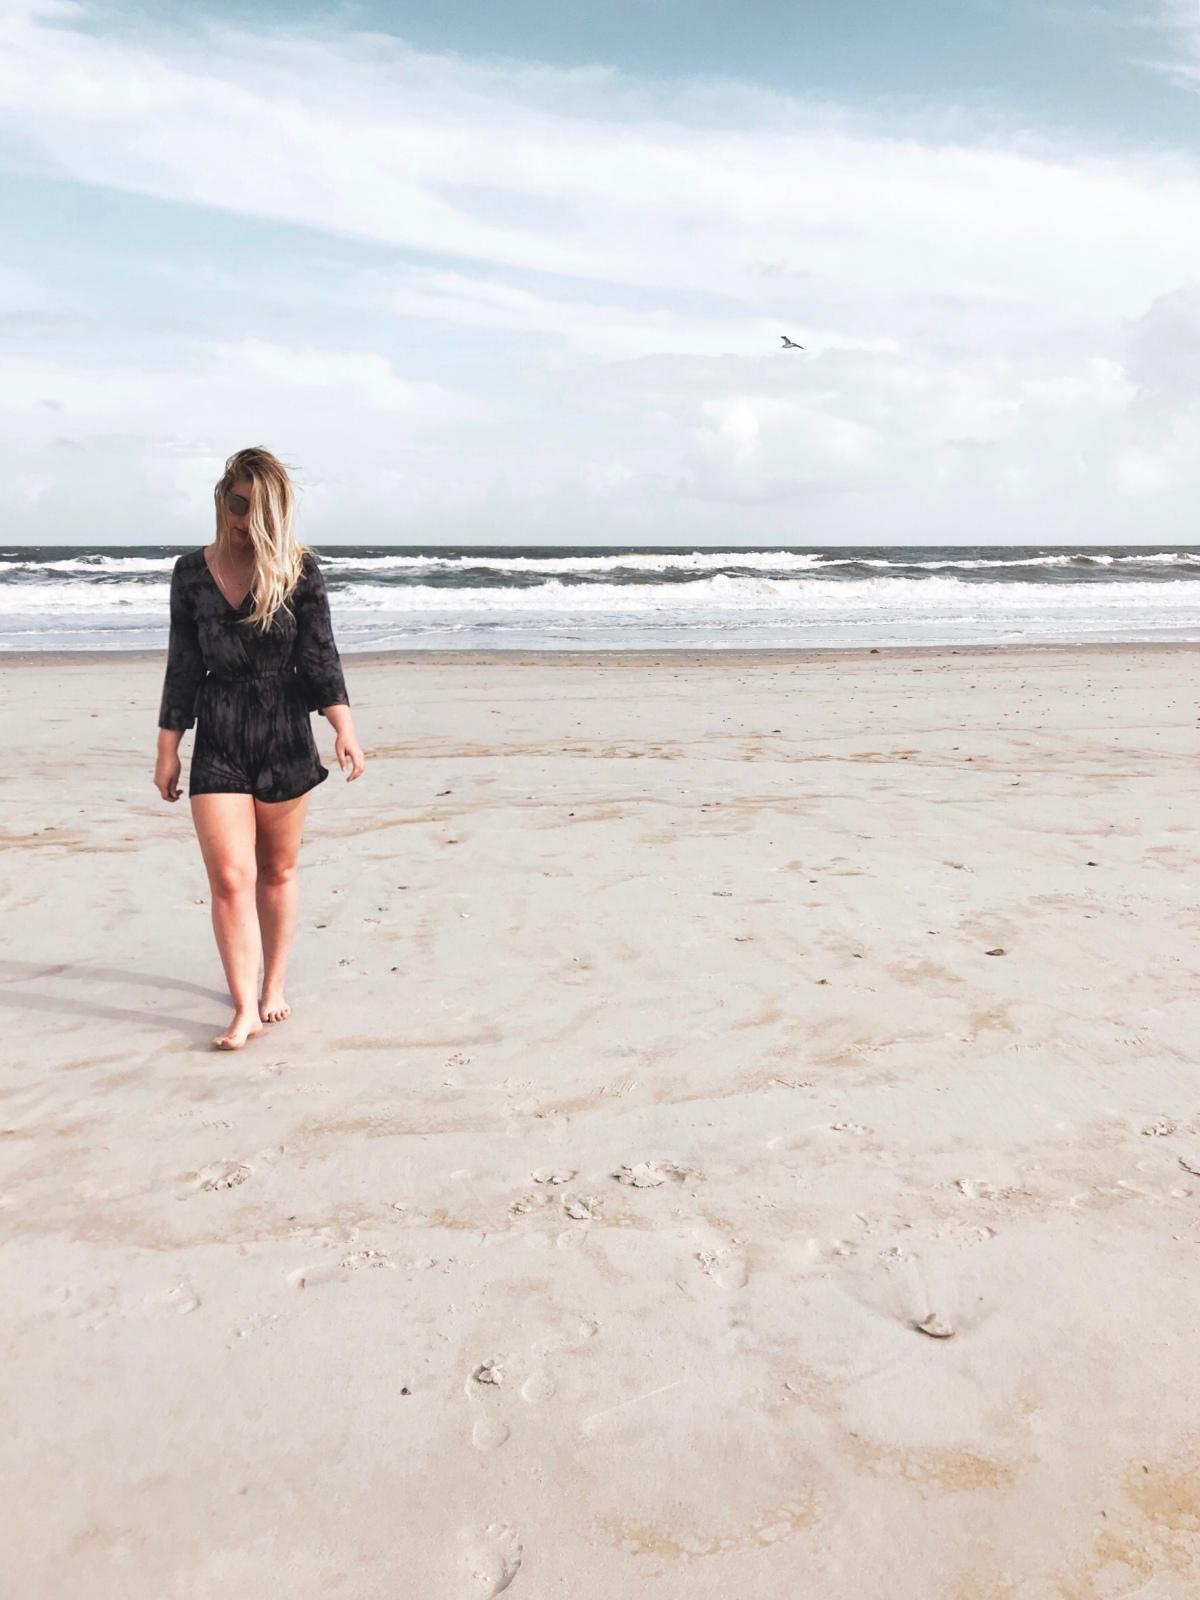 Mental Health – A Journey Not aDestination